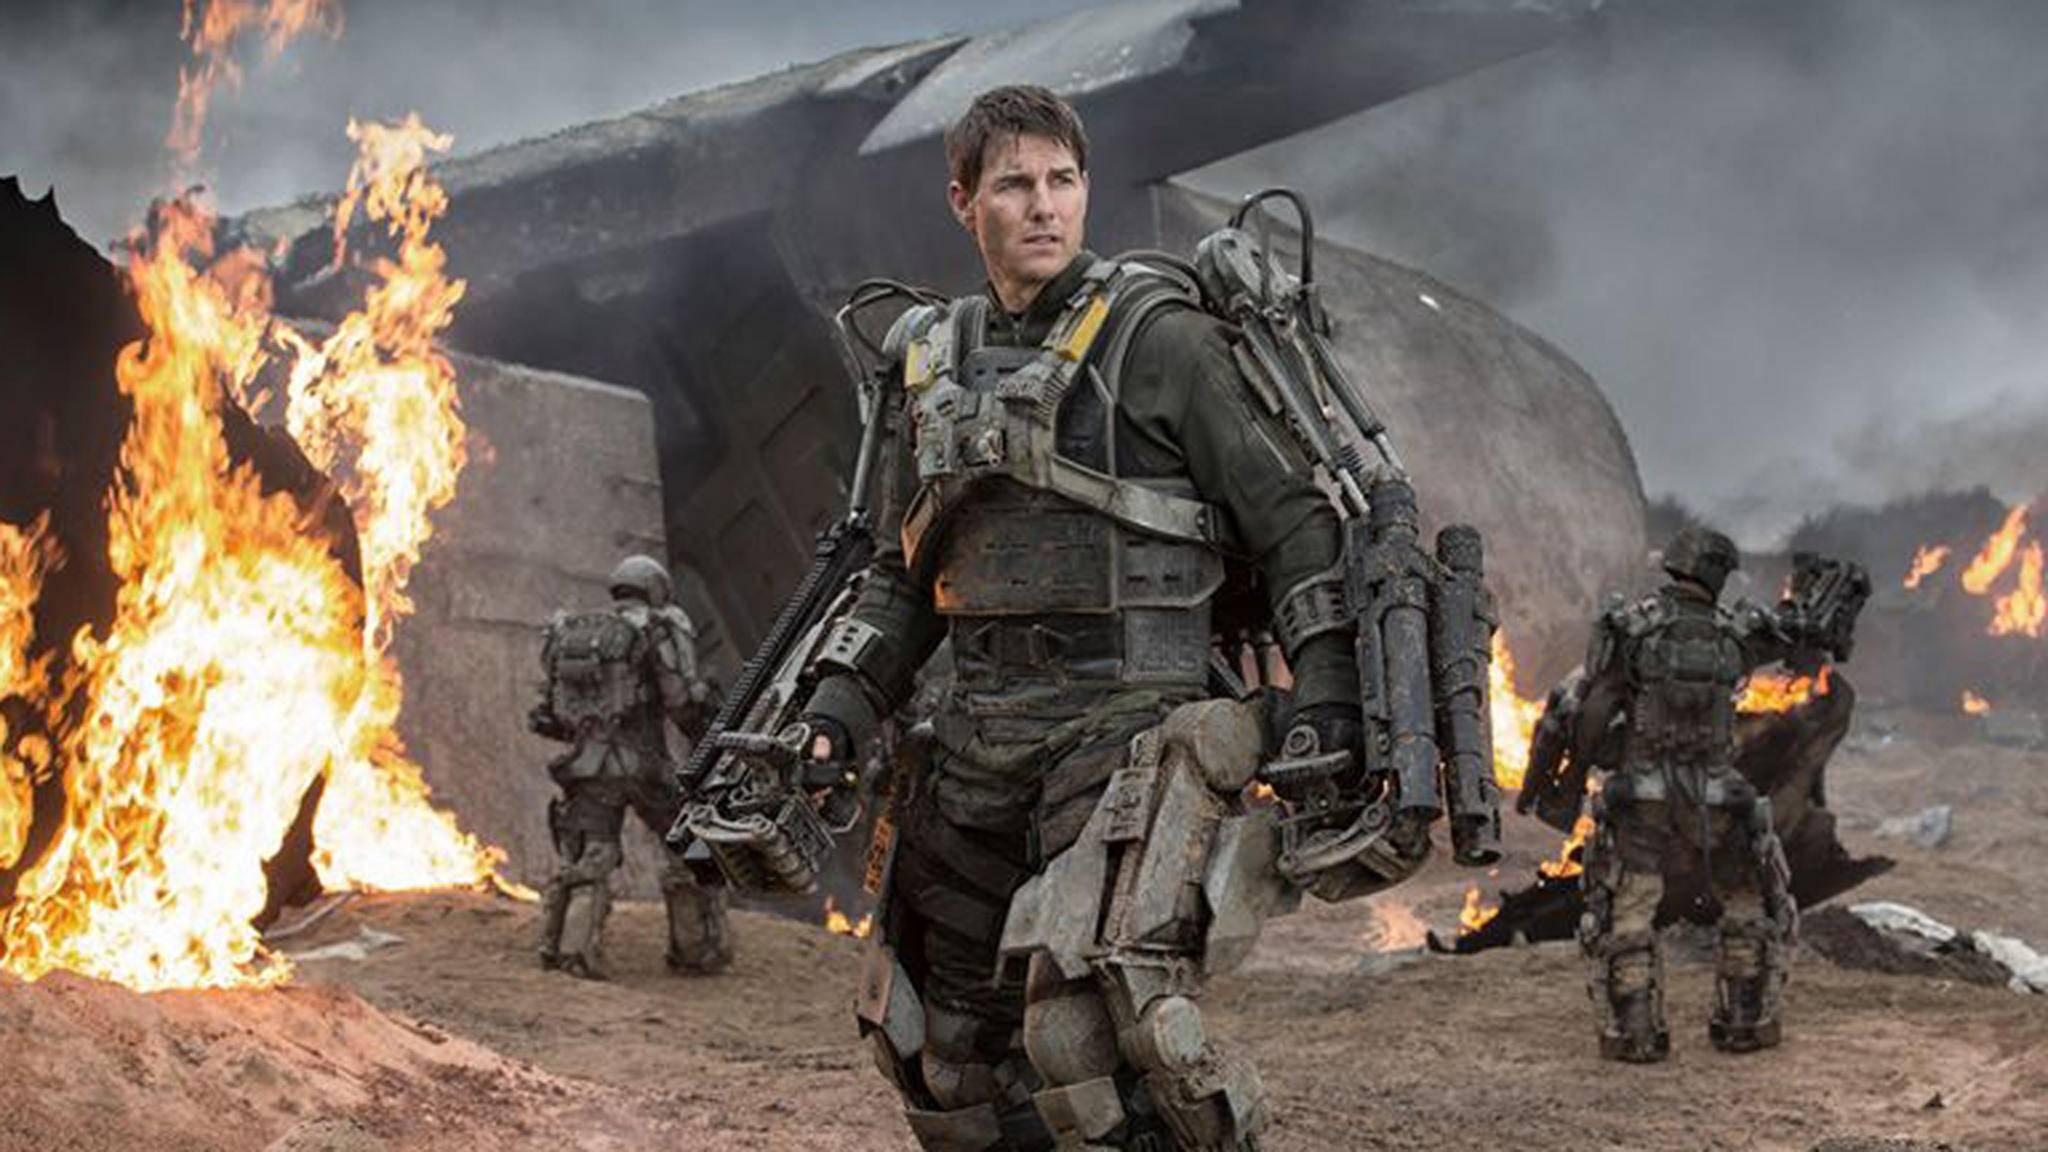 Edge of Tomorrow Tom Cruise